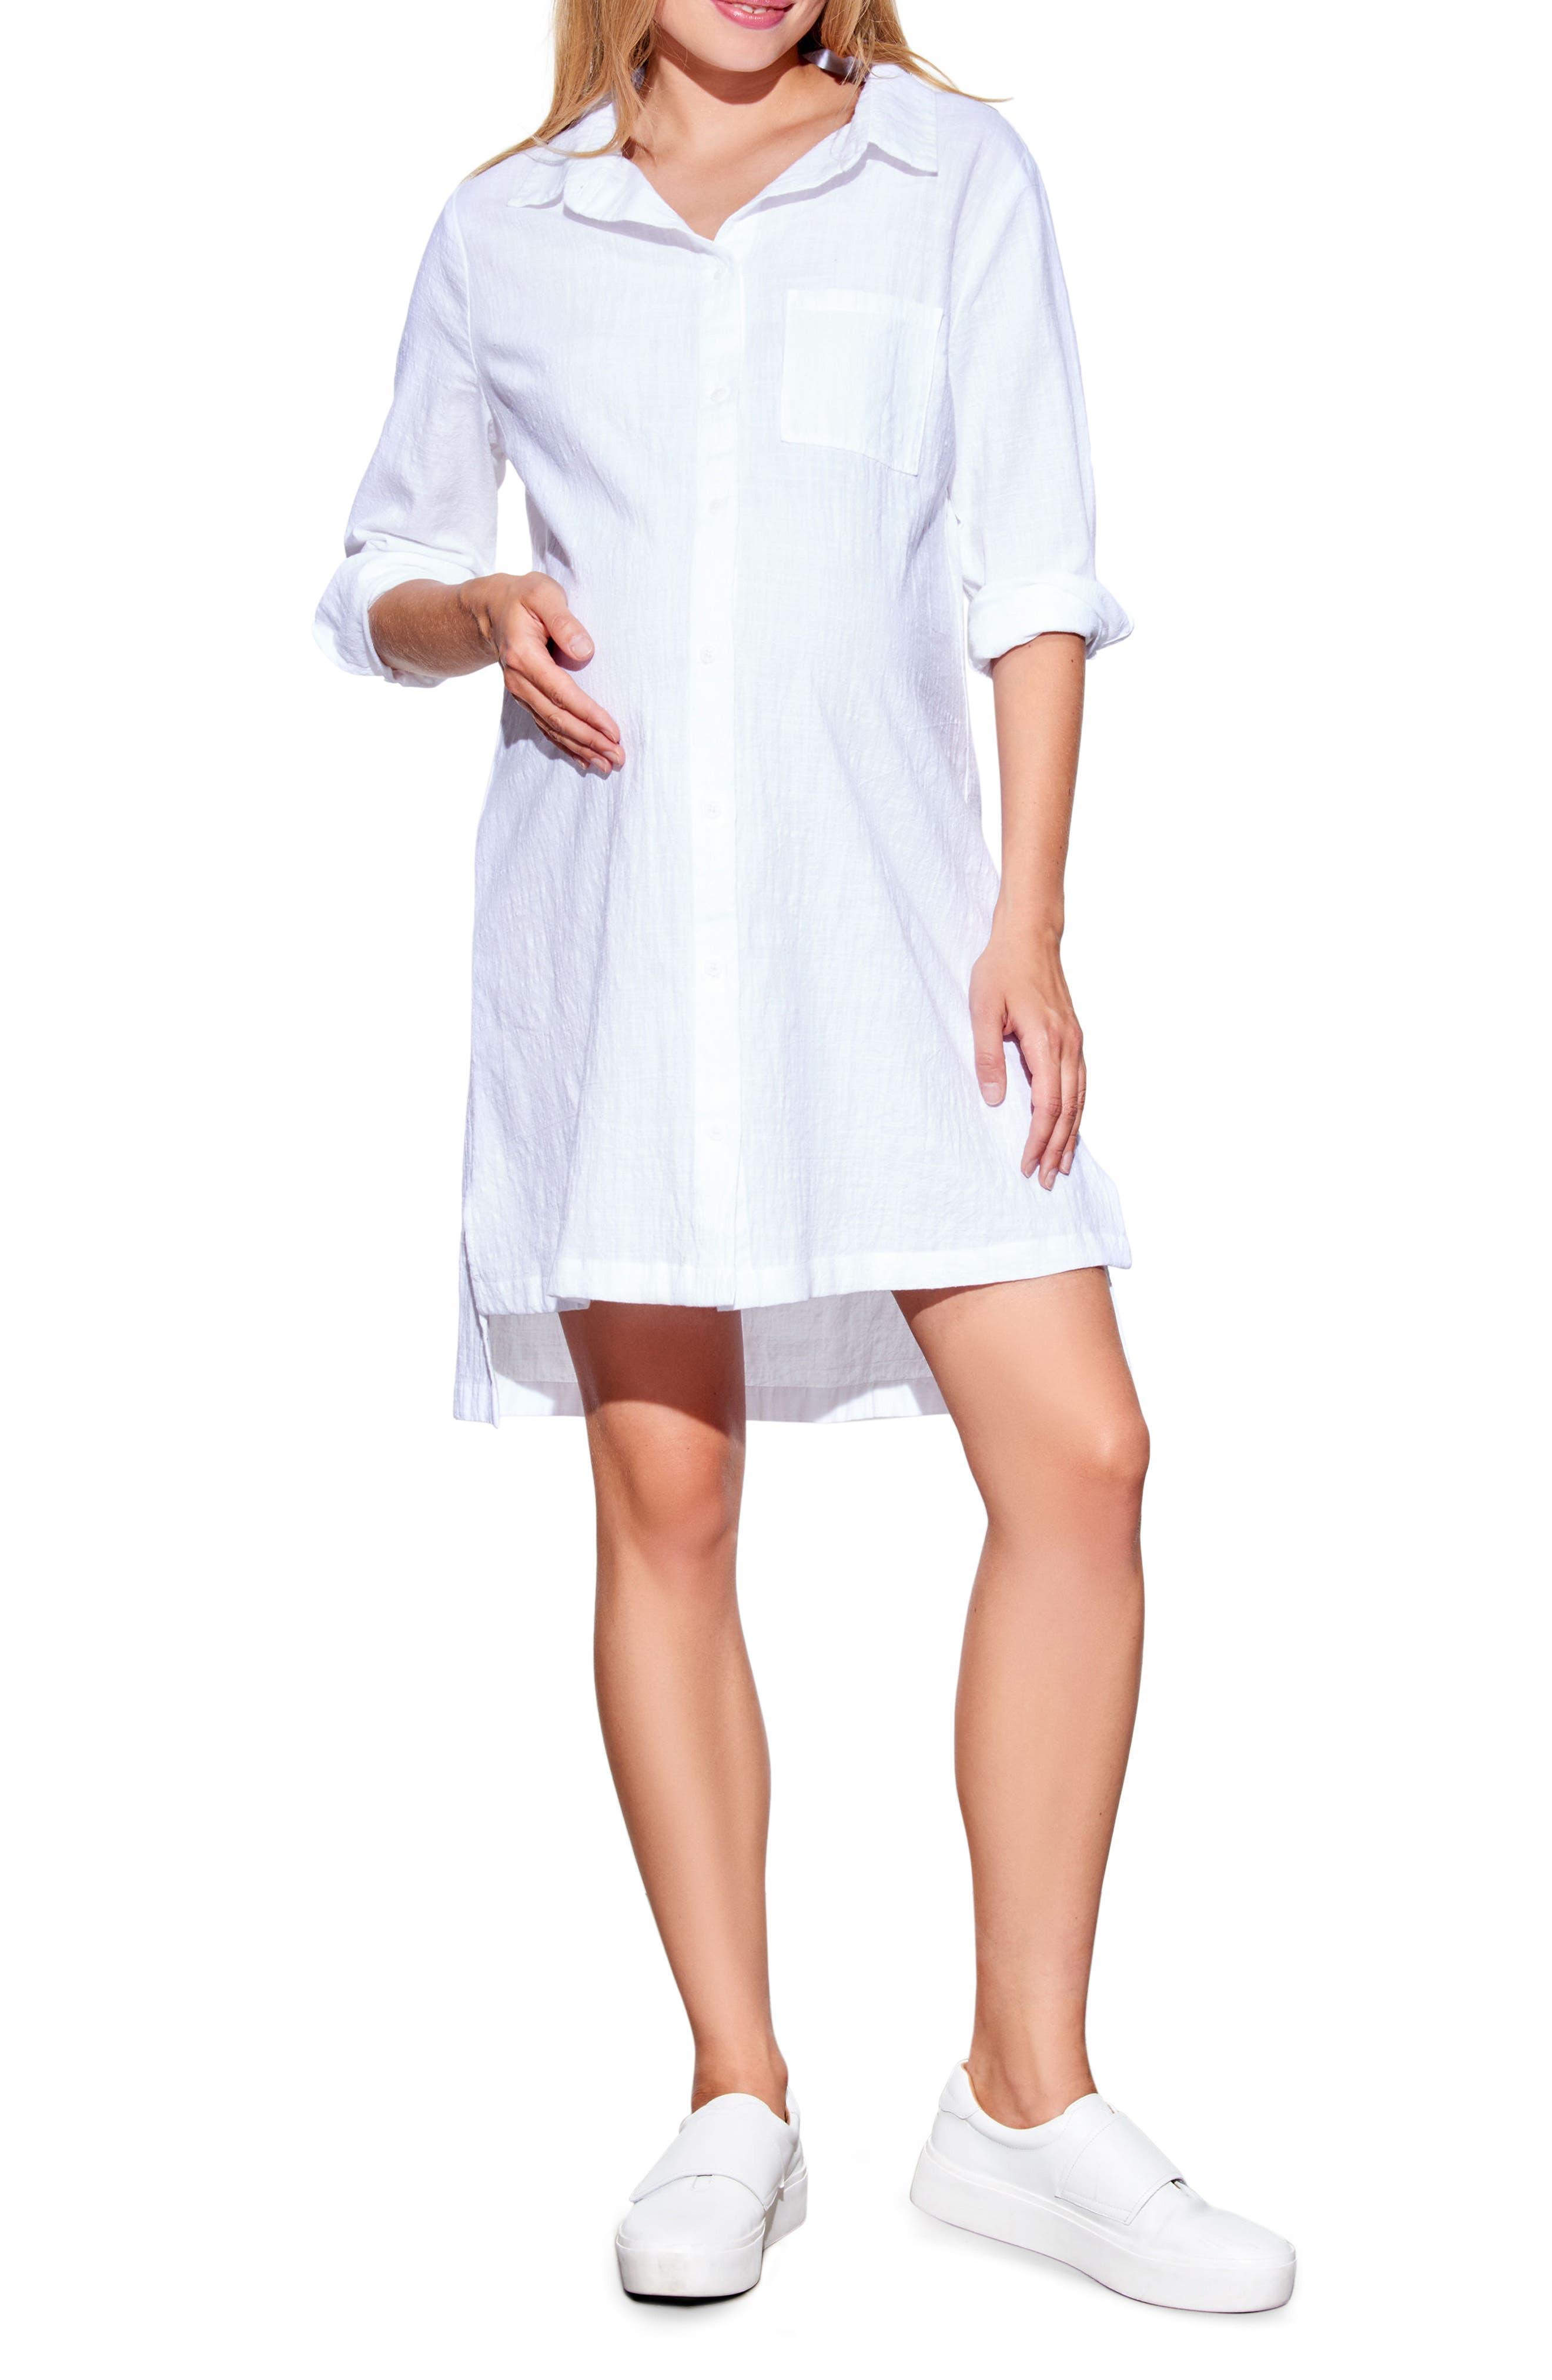 Maternal America High/Low Maternity Shirtdress